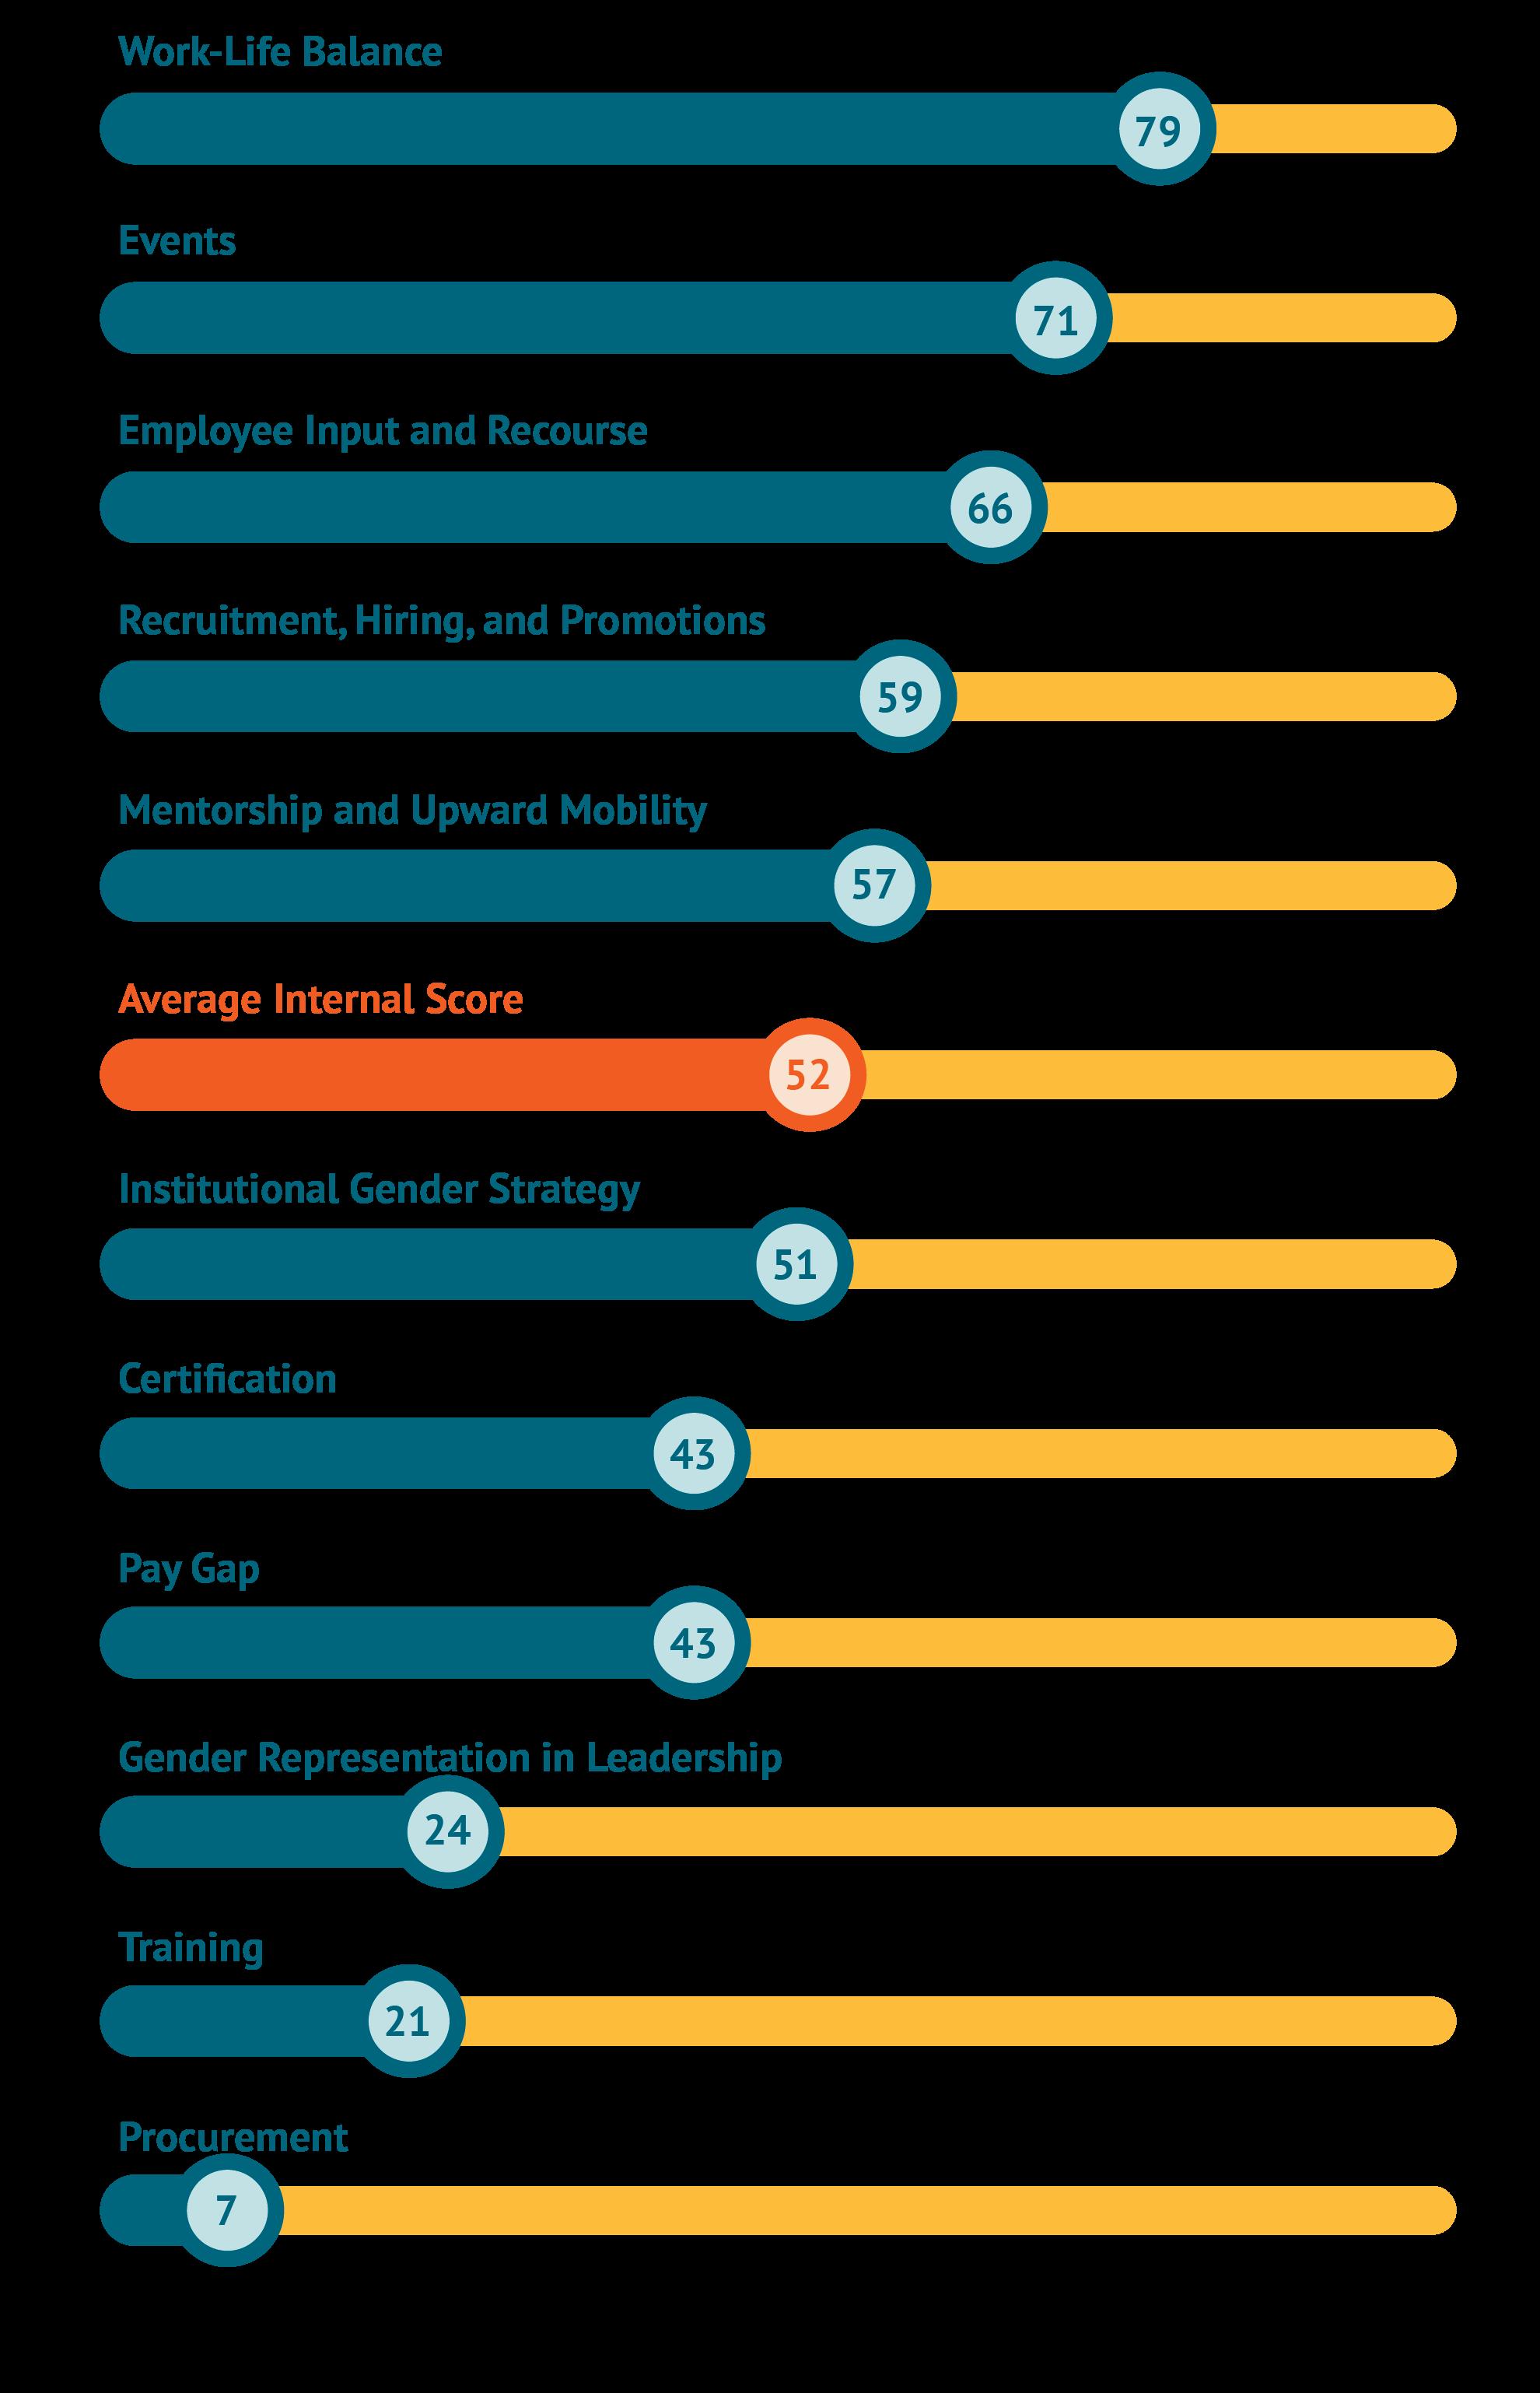 A figure showing average internal scores among DFIs